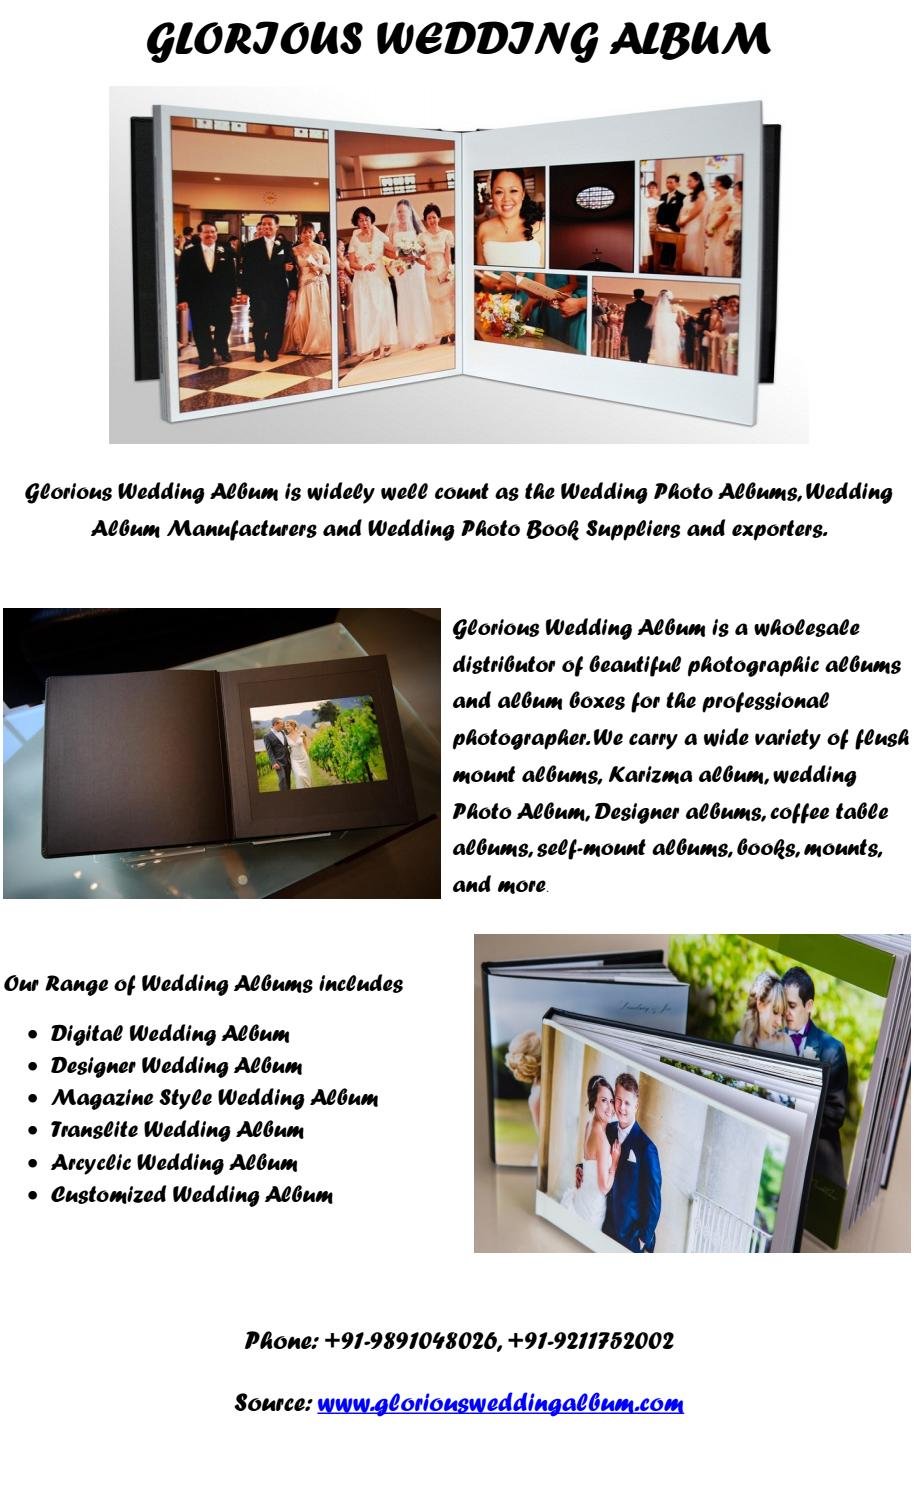 Wedding Albums By Glorious Wedding Album By Gloriousweddingalbum Issuu